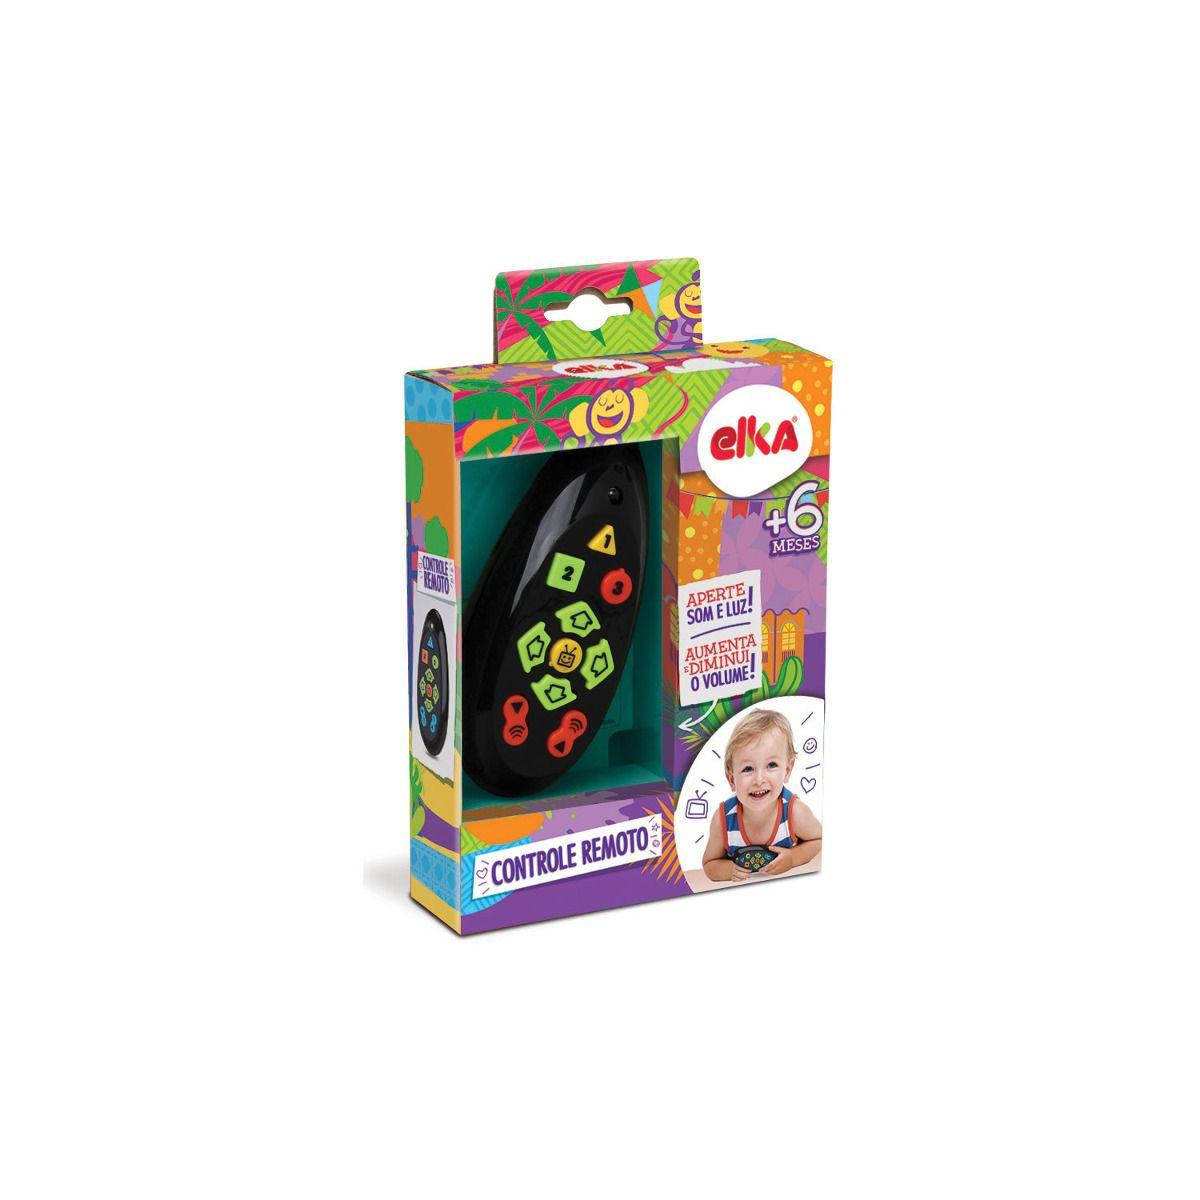 Brinquedo para Bebe Controle Remoto com Sons 728 Elka